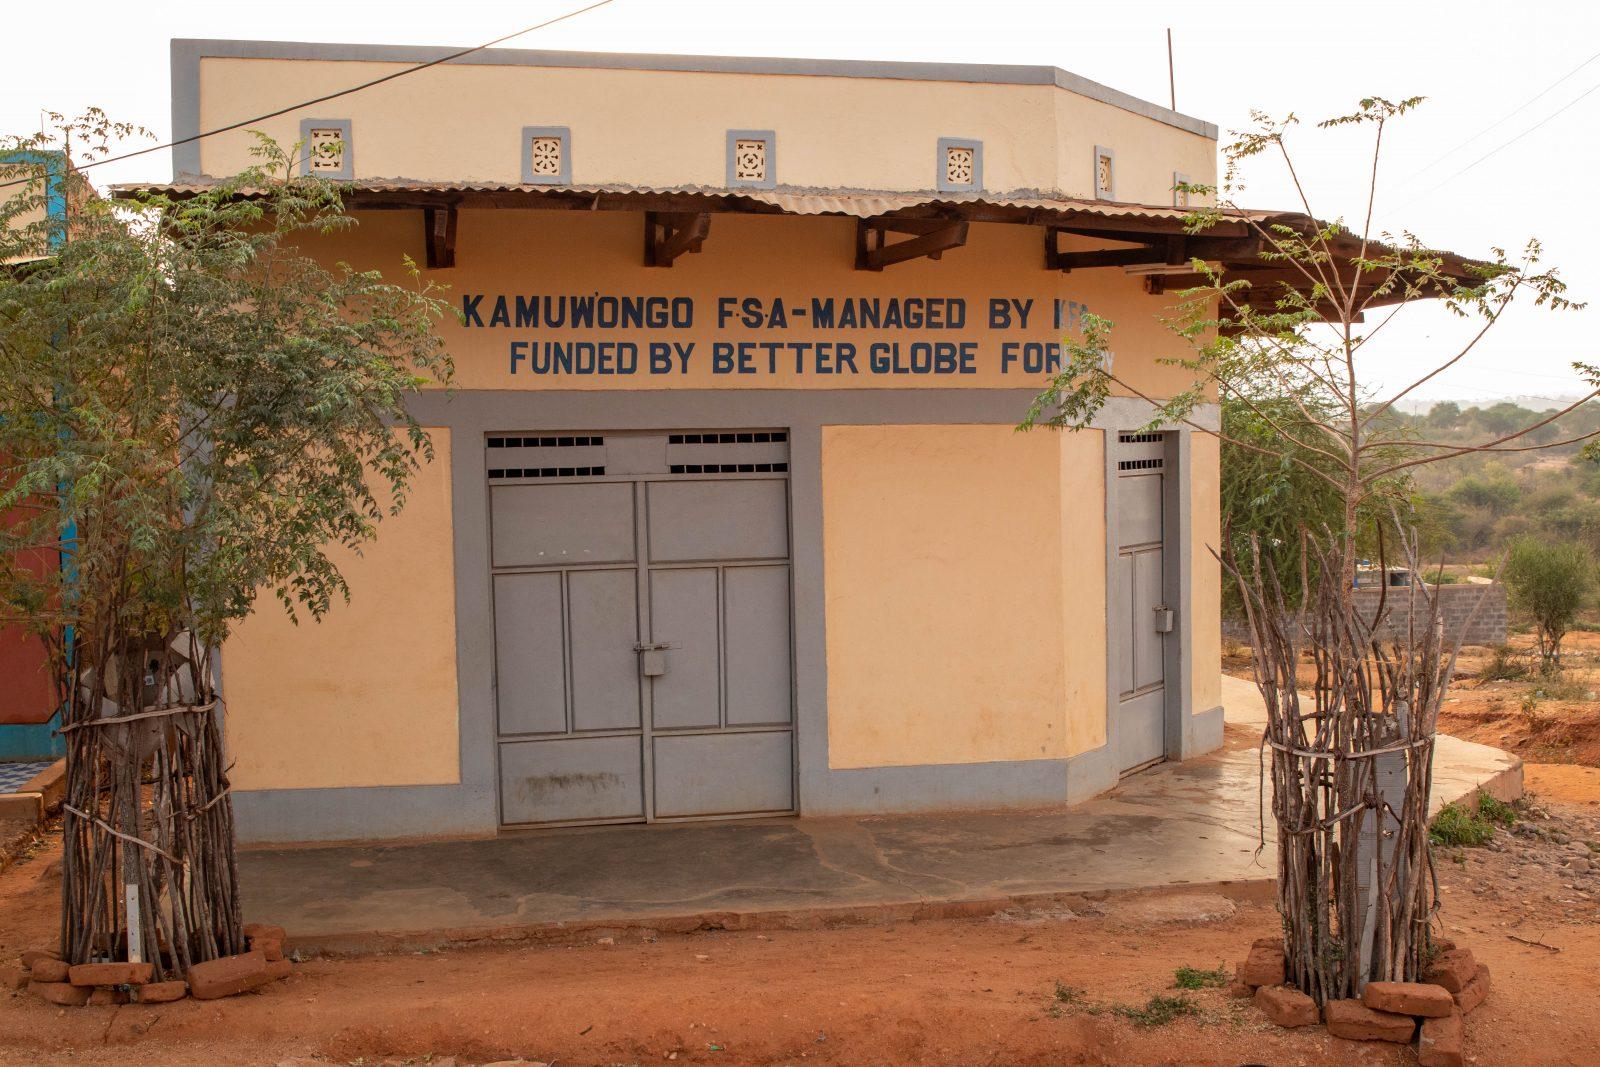 Den nyöppnade mikrolånbanken i staden Kamuwongo i närheten av Kiambere-plantagen.